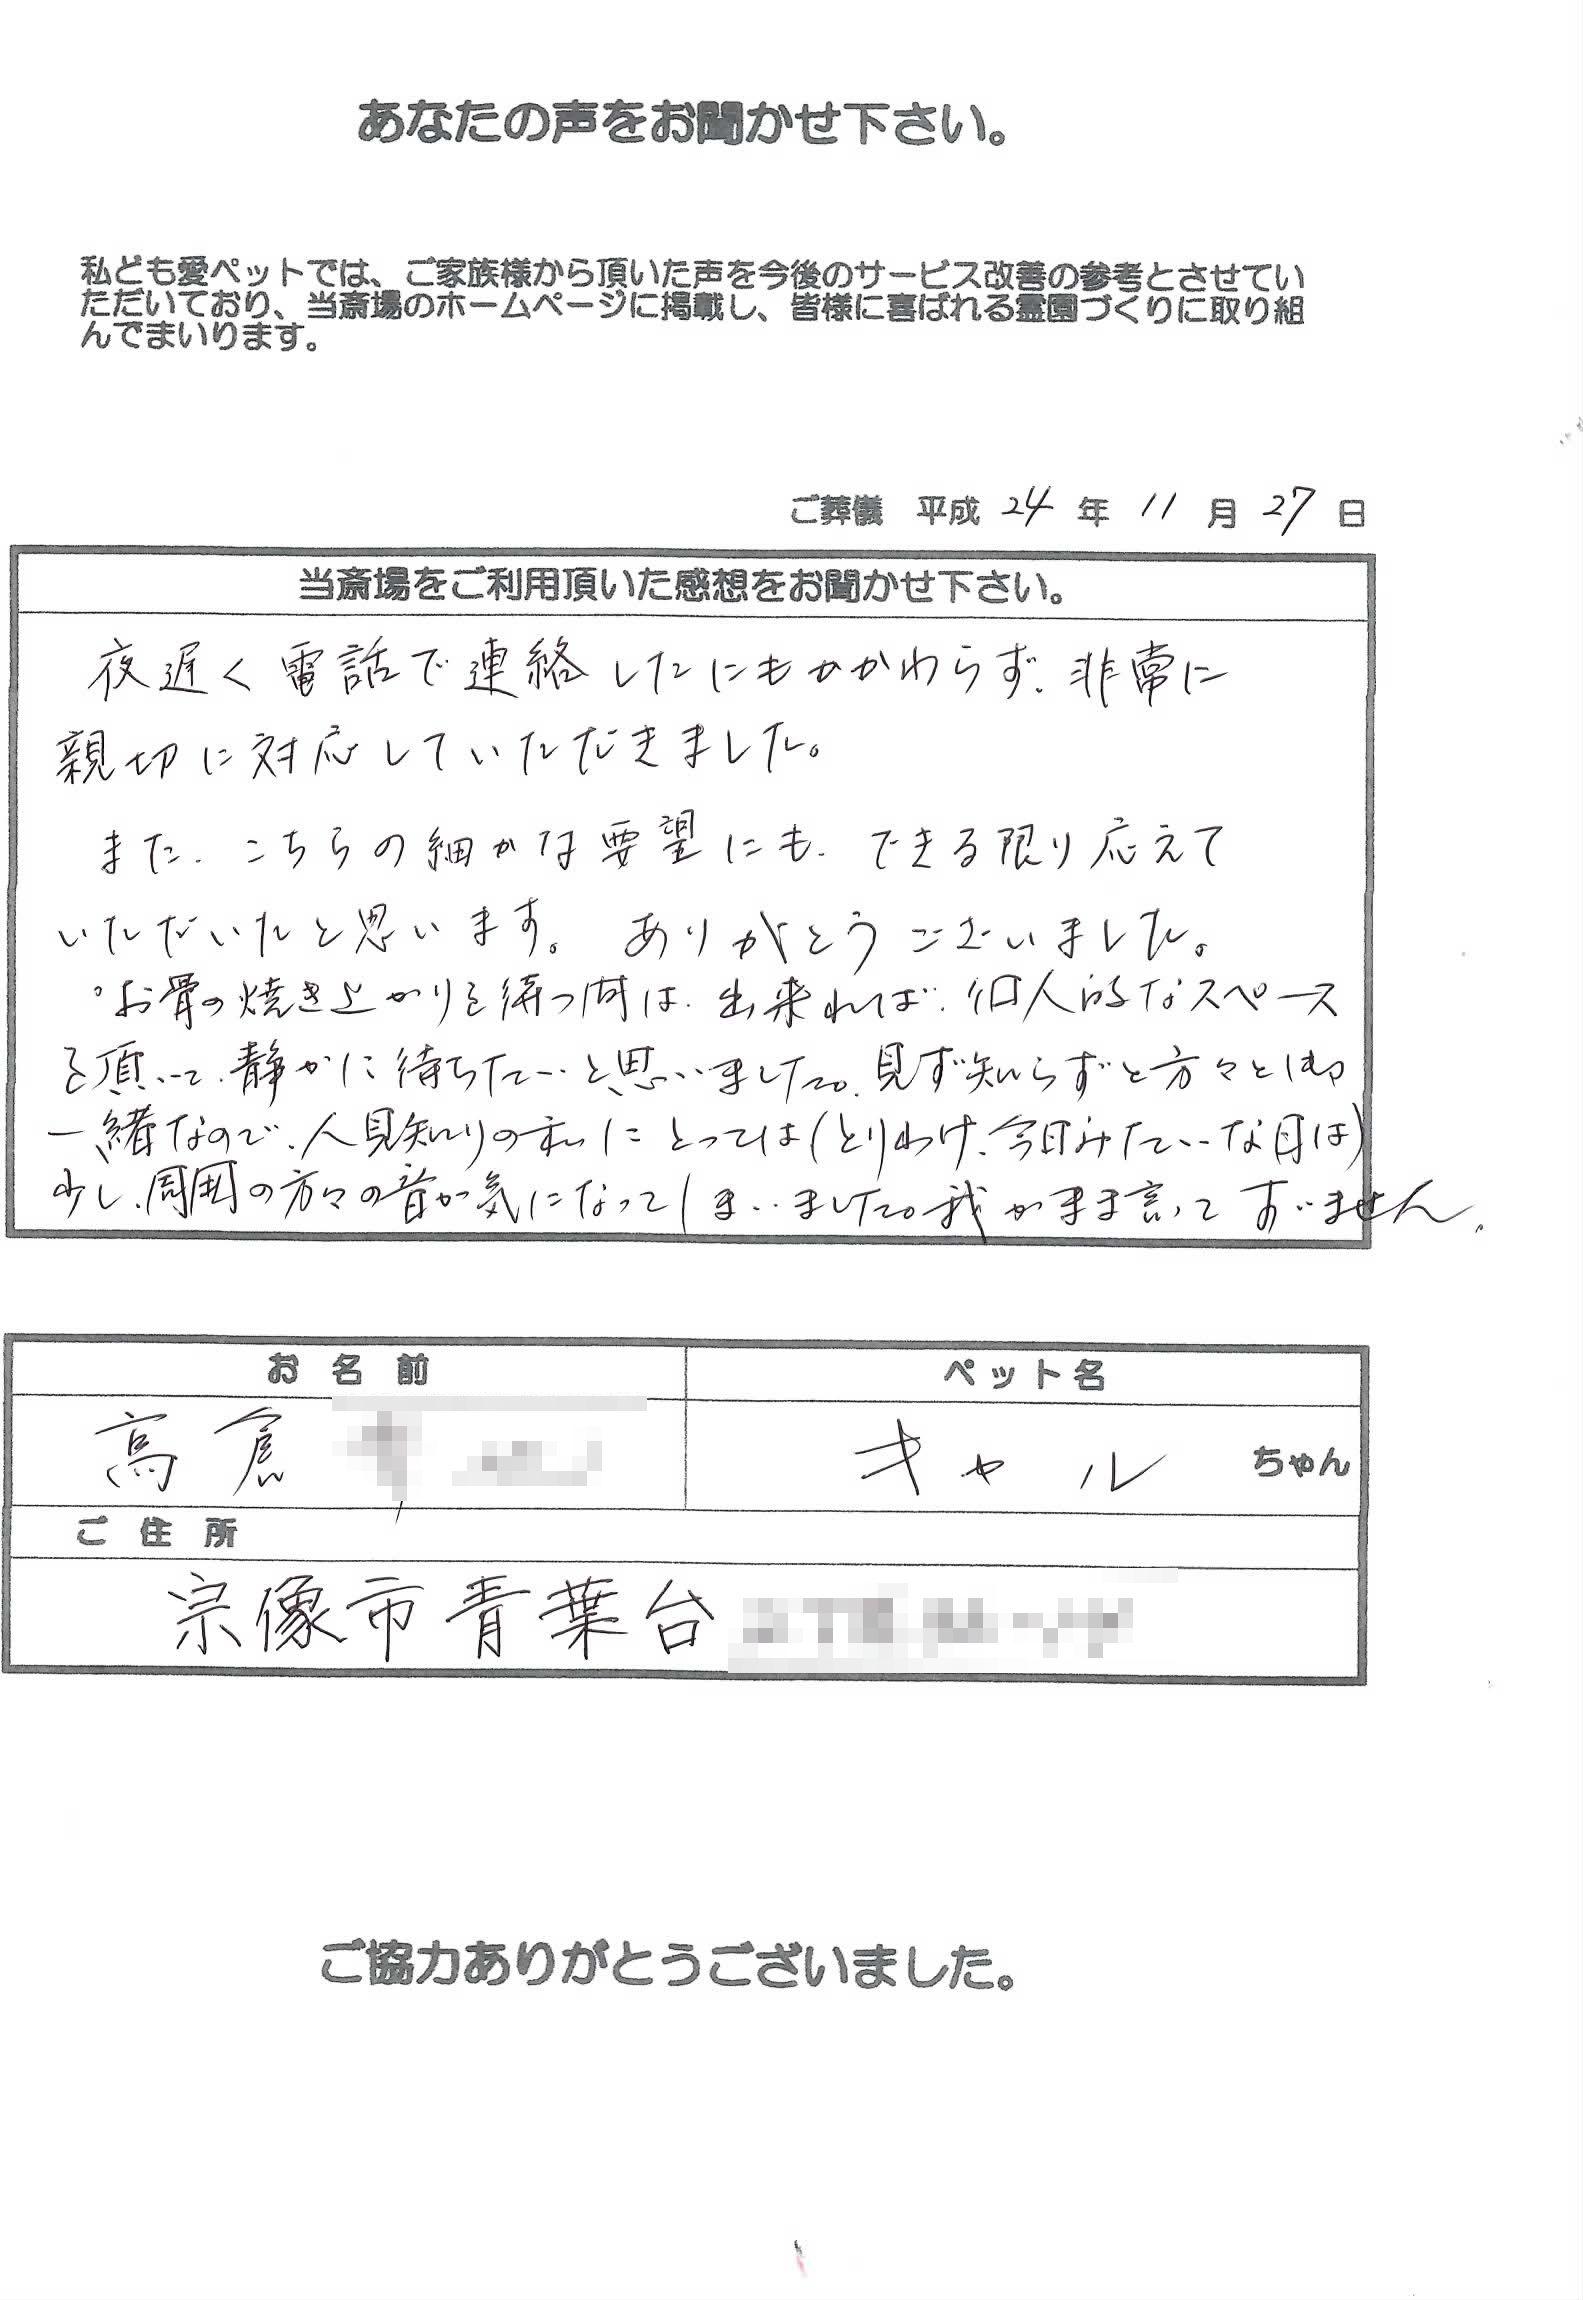 k121127-3.jpg